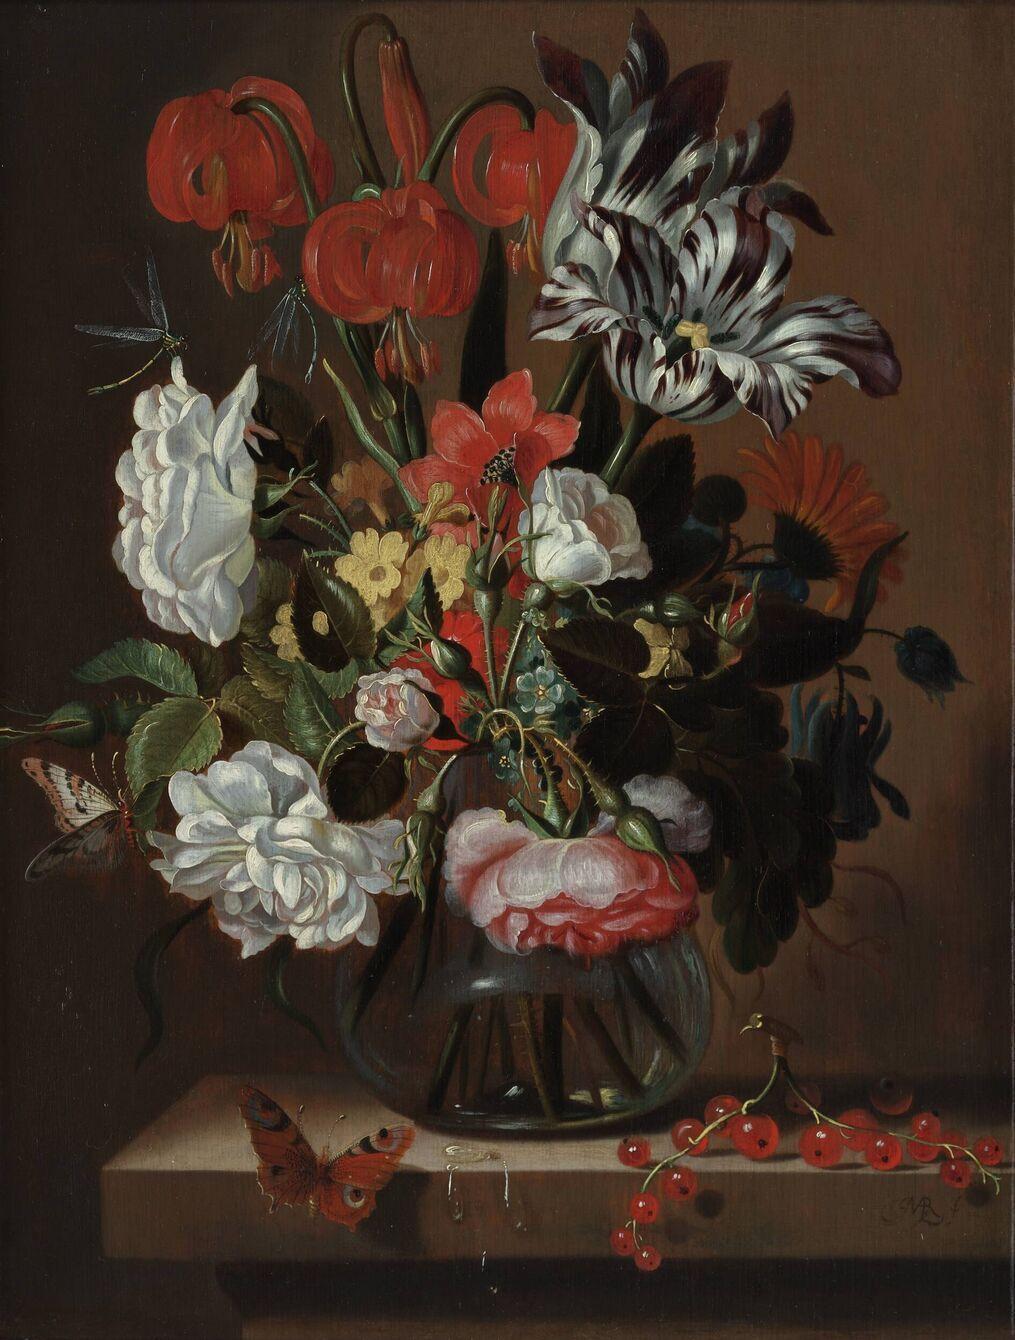 still life vase of flowers of dœdnn'dµn€ n†d²dµn'd¾n‡d½d¾d³d¾ d½dn'nŽn€d¼d¾n€n'd d¯dod inside dœdnn'dµn€ n†d²dµn'd¾n‡d½d¾d³d¾ d½dn'nŽn€d¼d¾n€n'd d¯dod